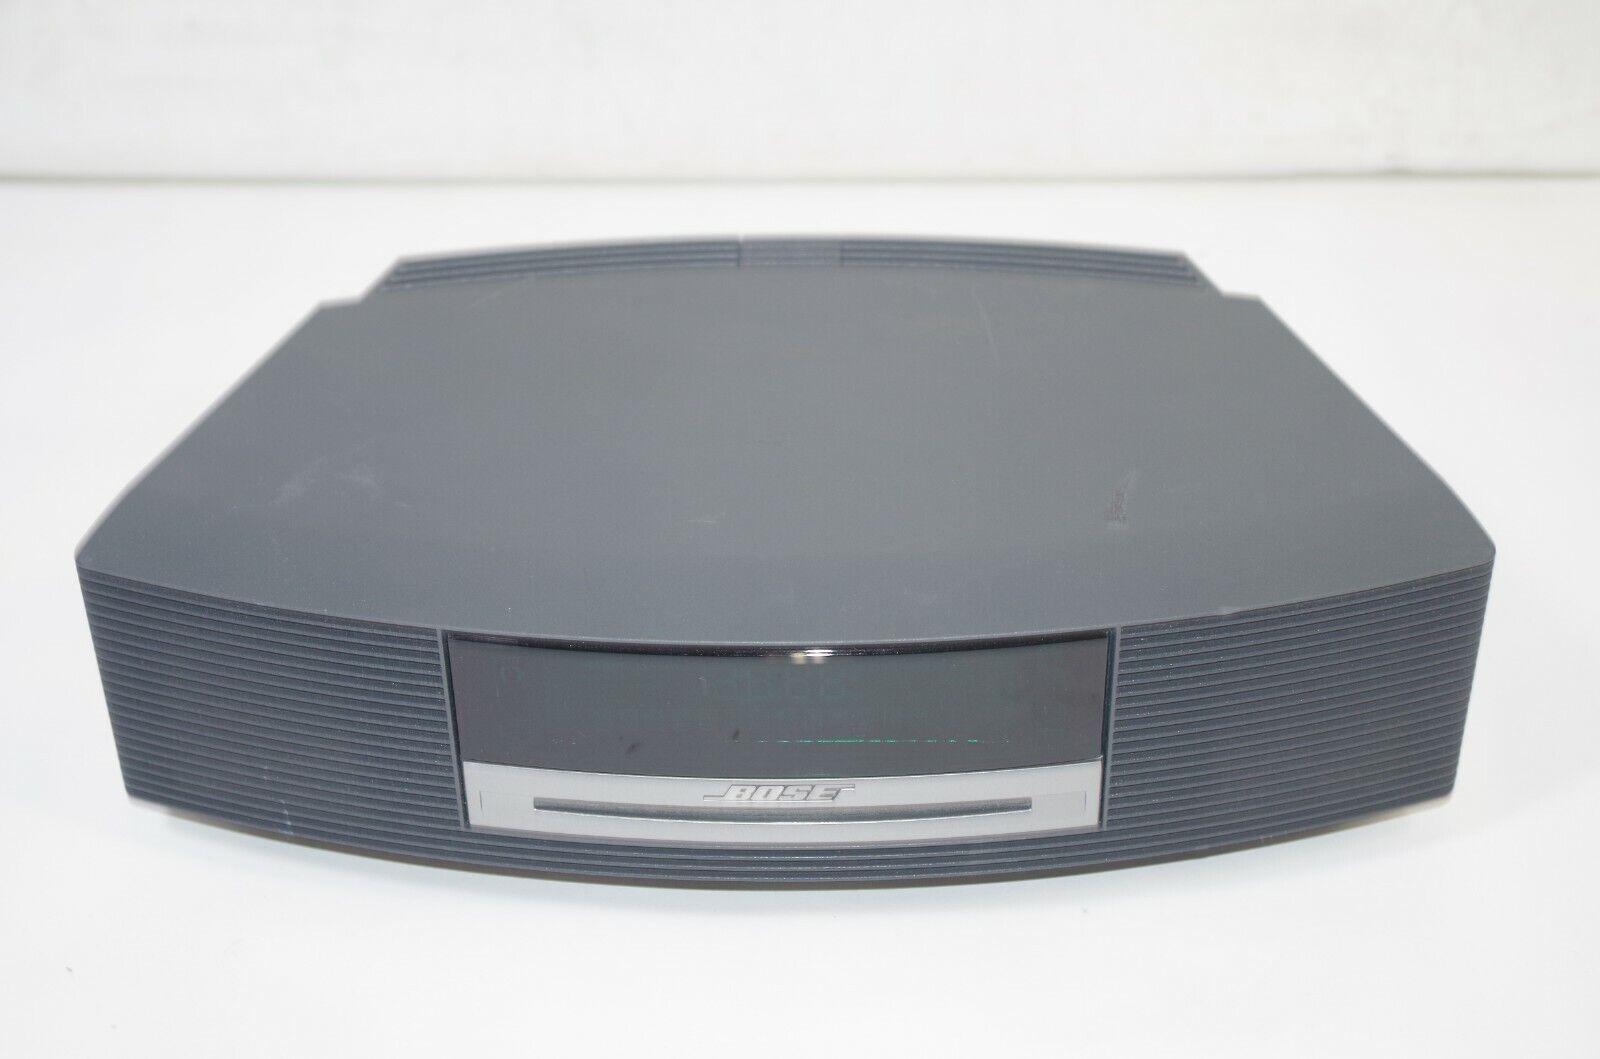 Bose Wave Music System AM/FM Radio CD Player AWRCC1 No Sound Parts Repair - $84.95